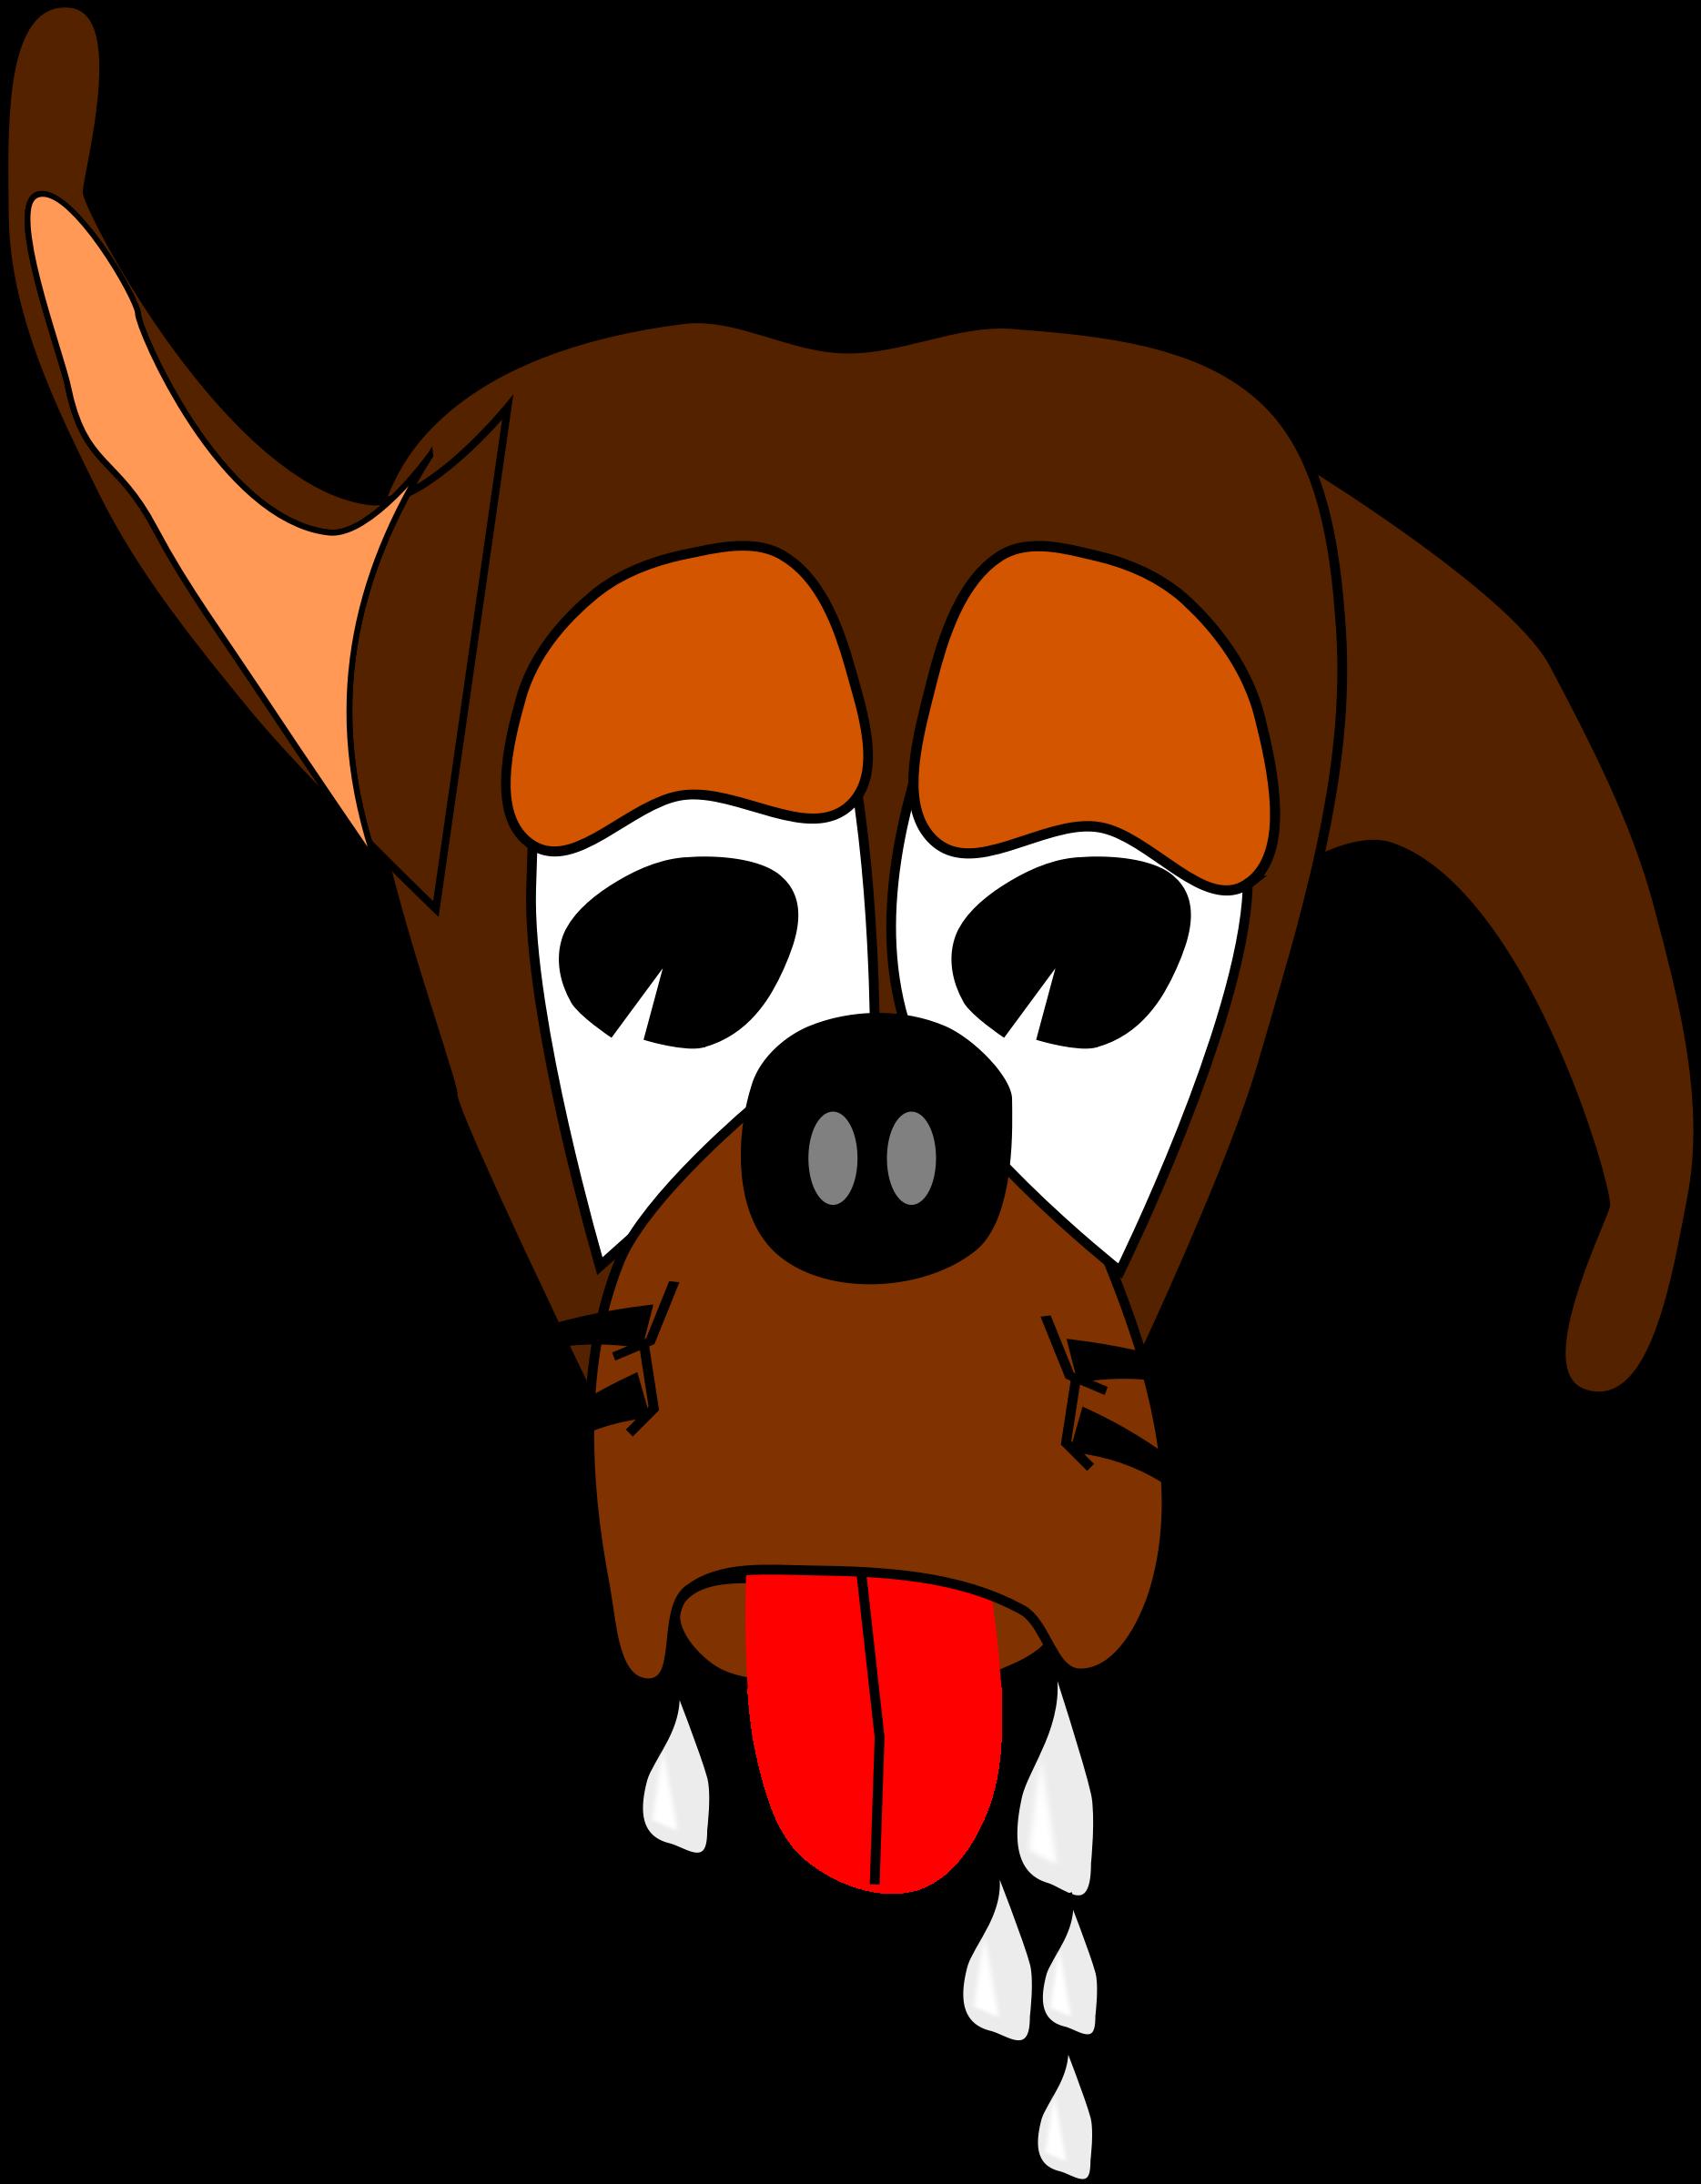 Clipart dogs cowboy. Salivating dog big image